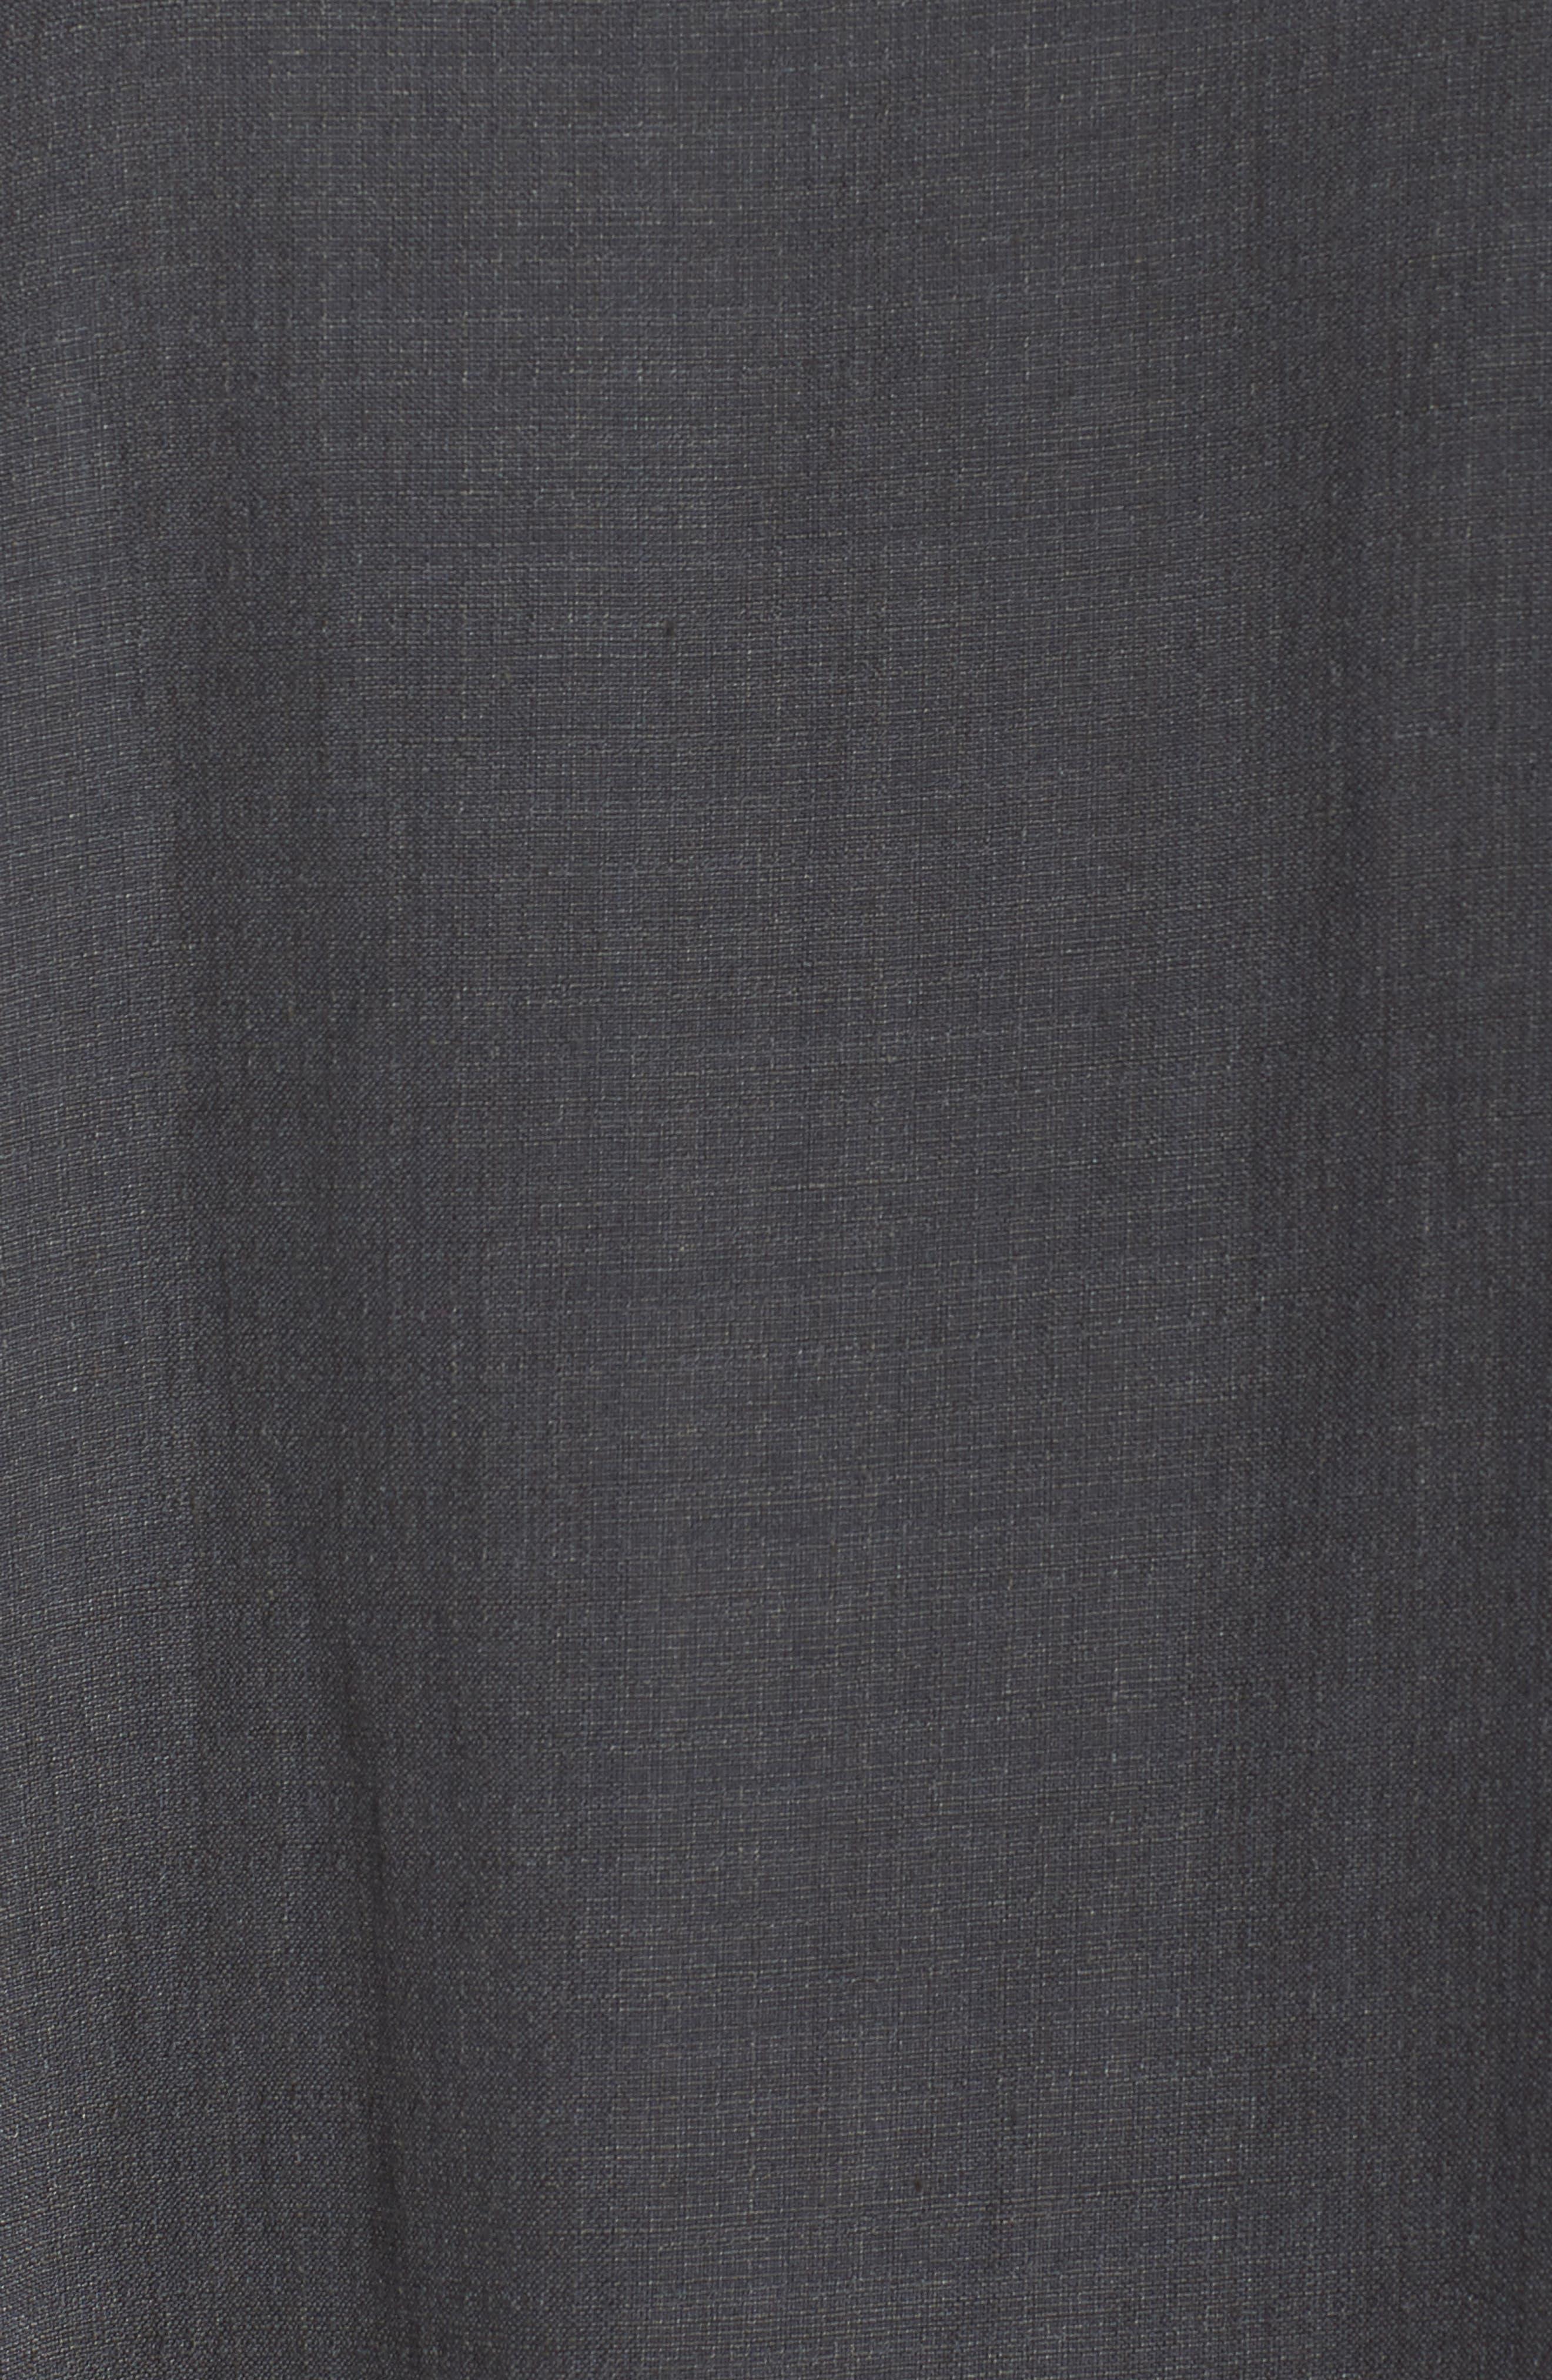 EILEEN FISHER,                             Linen Blend Shift Dress,                             Alternate thumbnail 5, color,                             025